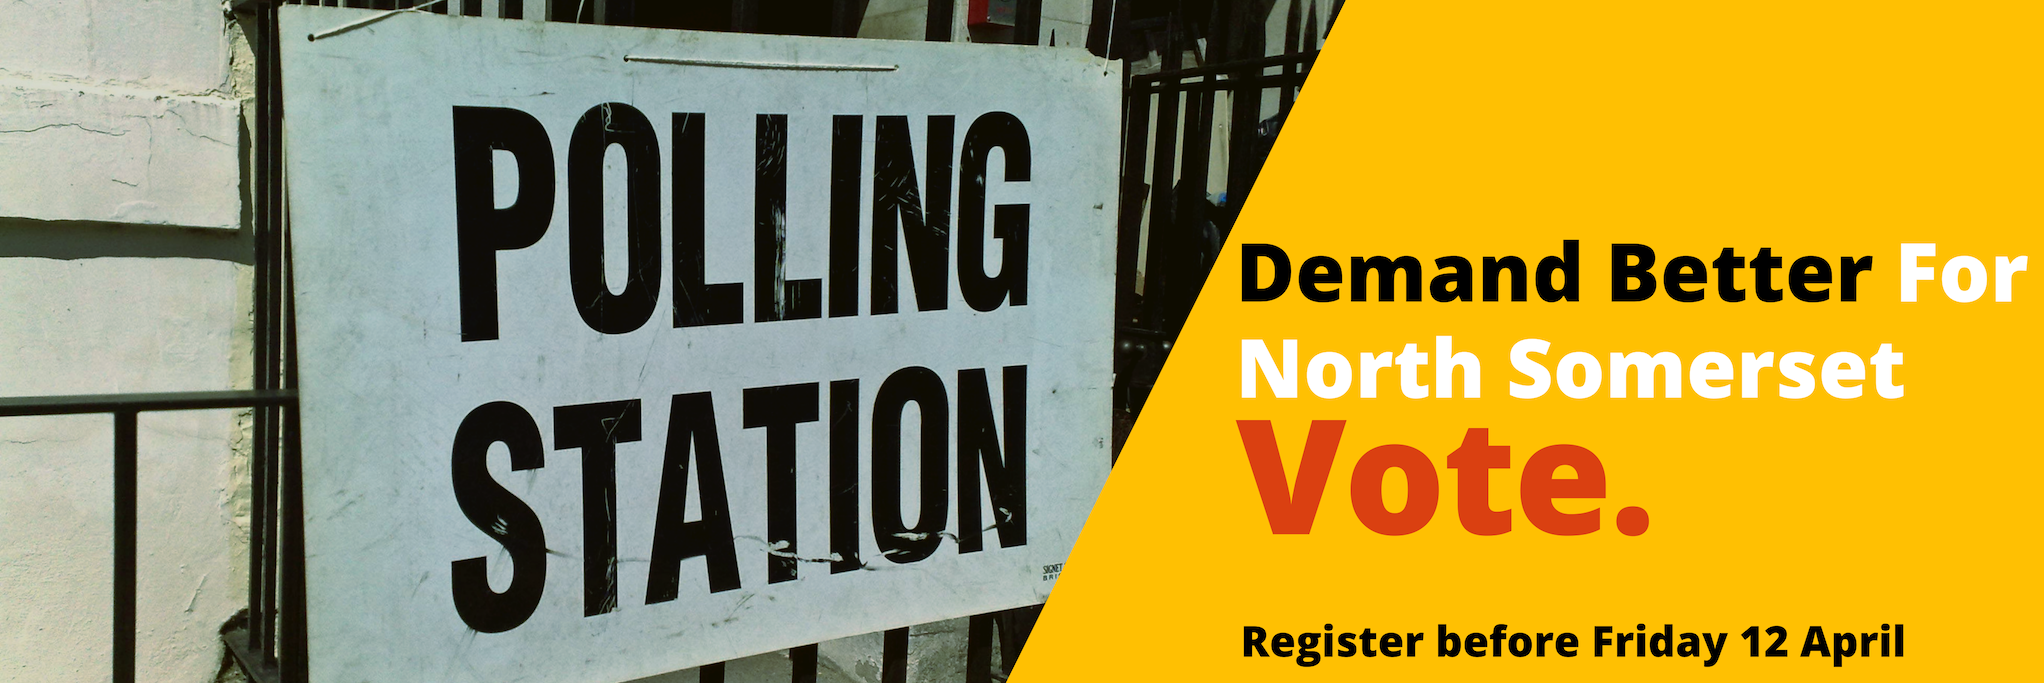 Demand Better For North Somerset: Vote